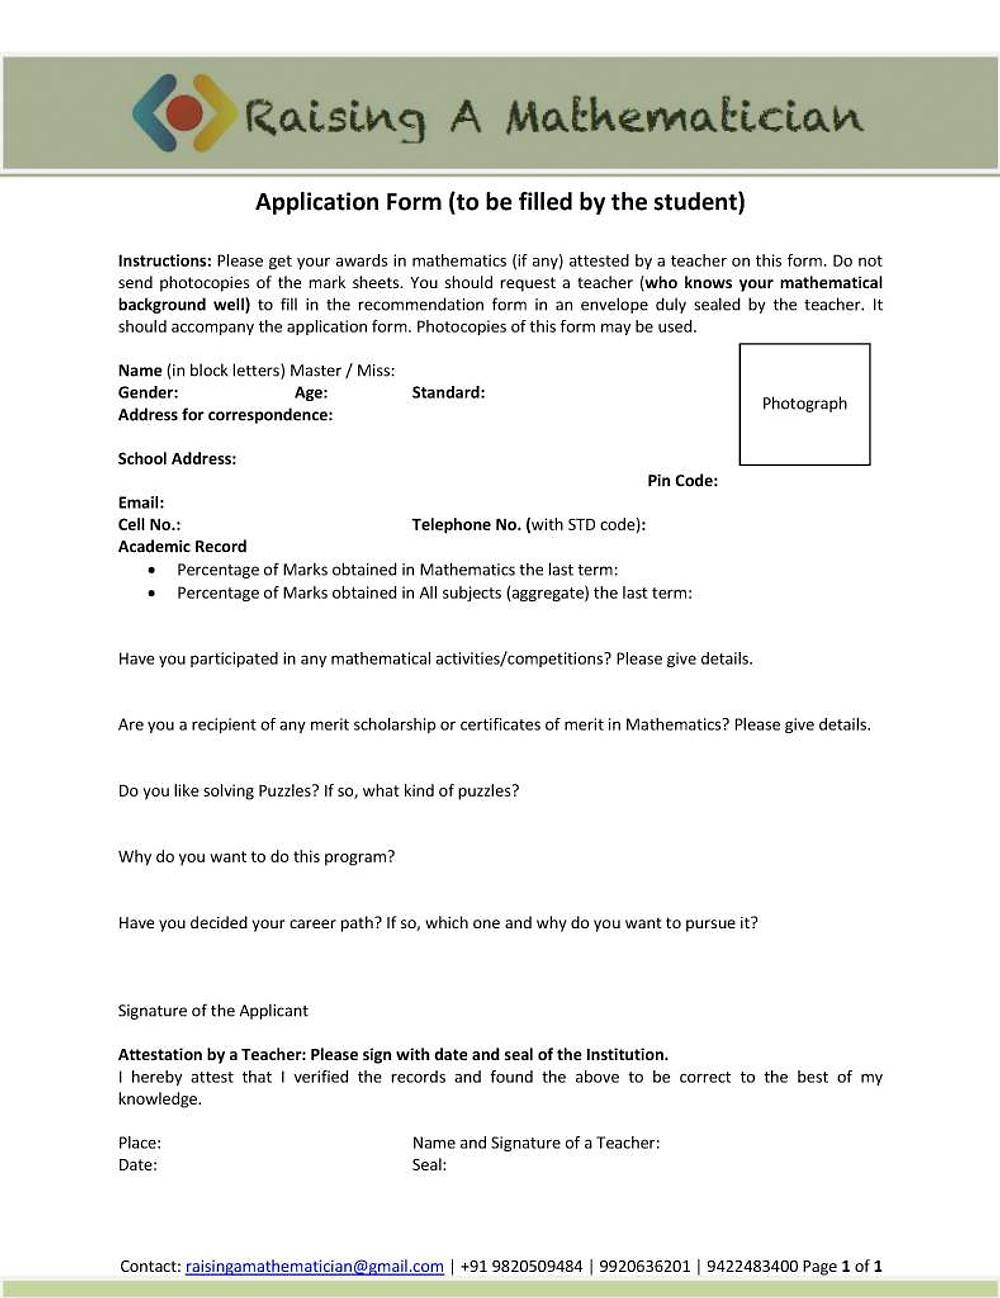 2. Application form